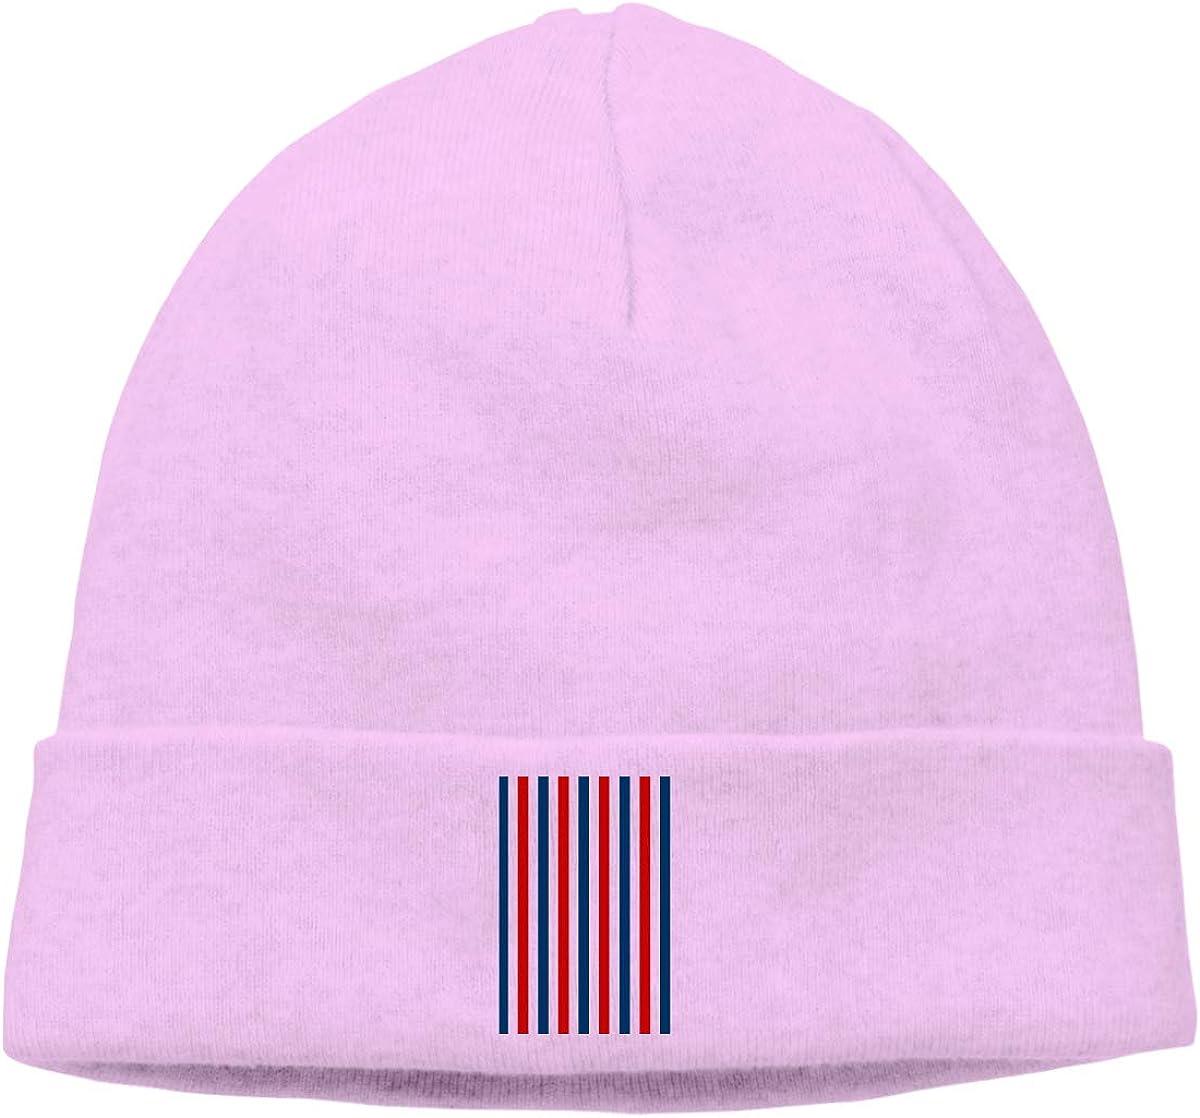 Cgi03T-2 Casual Woolen Cap for Unisex Stripes American Flag Stocking Cap